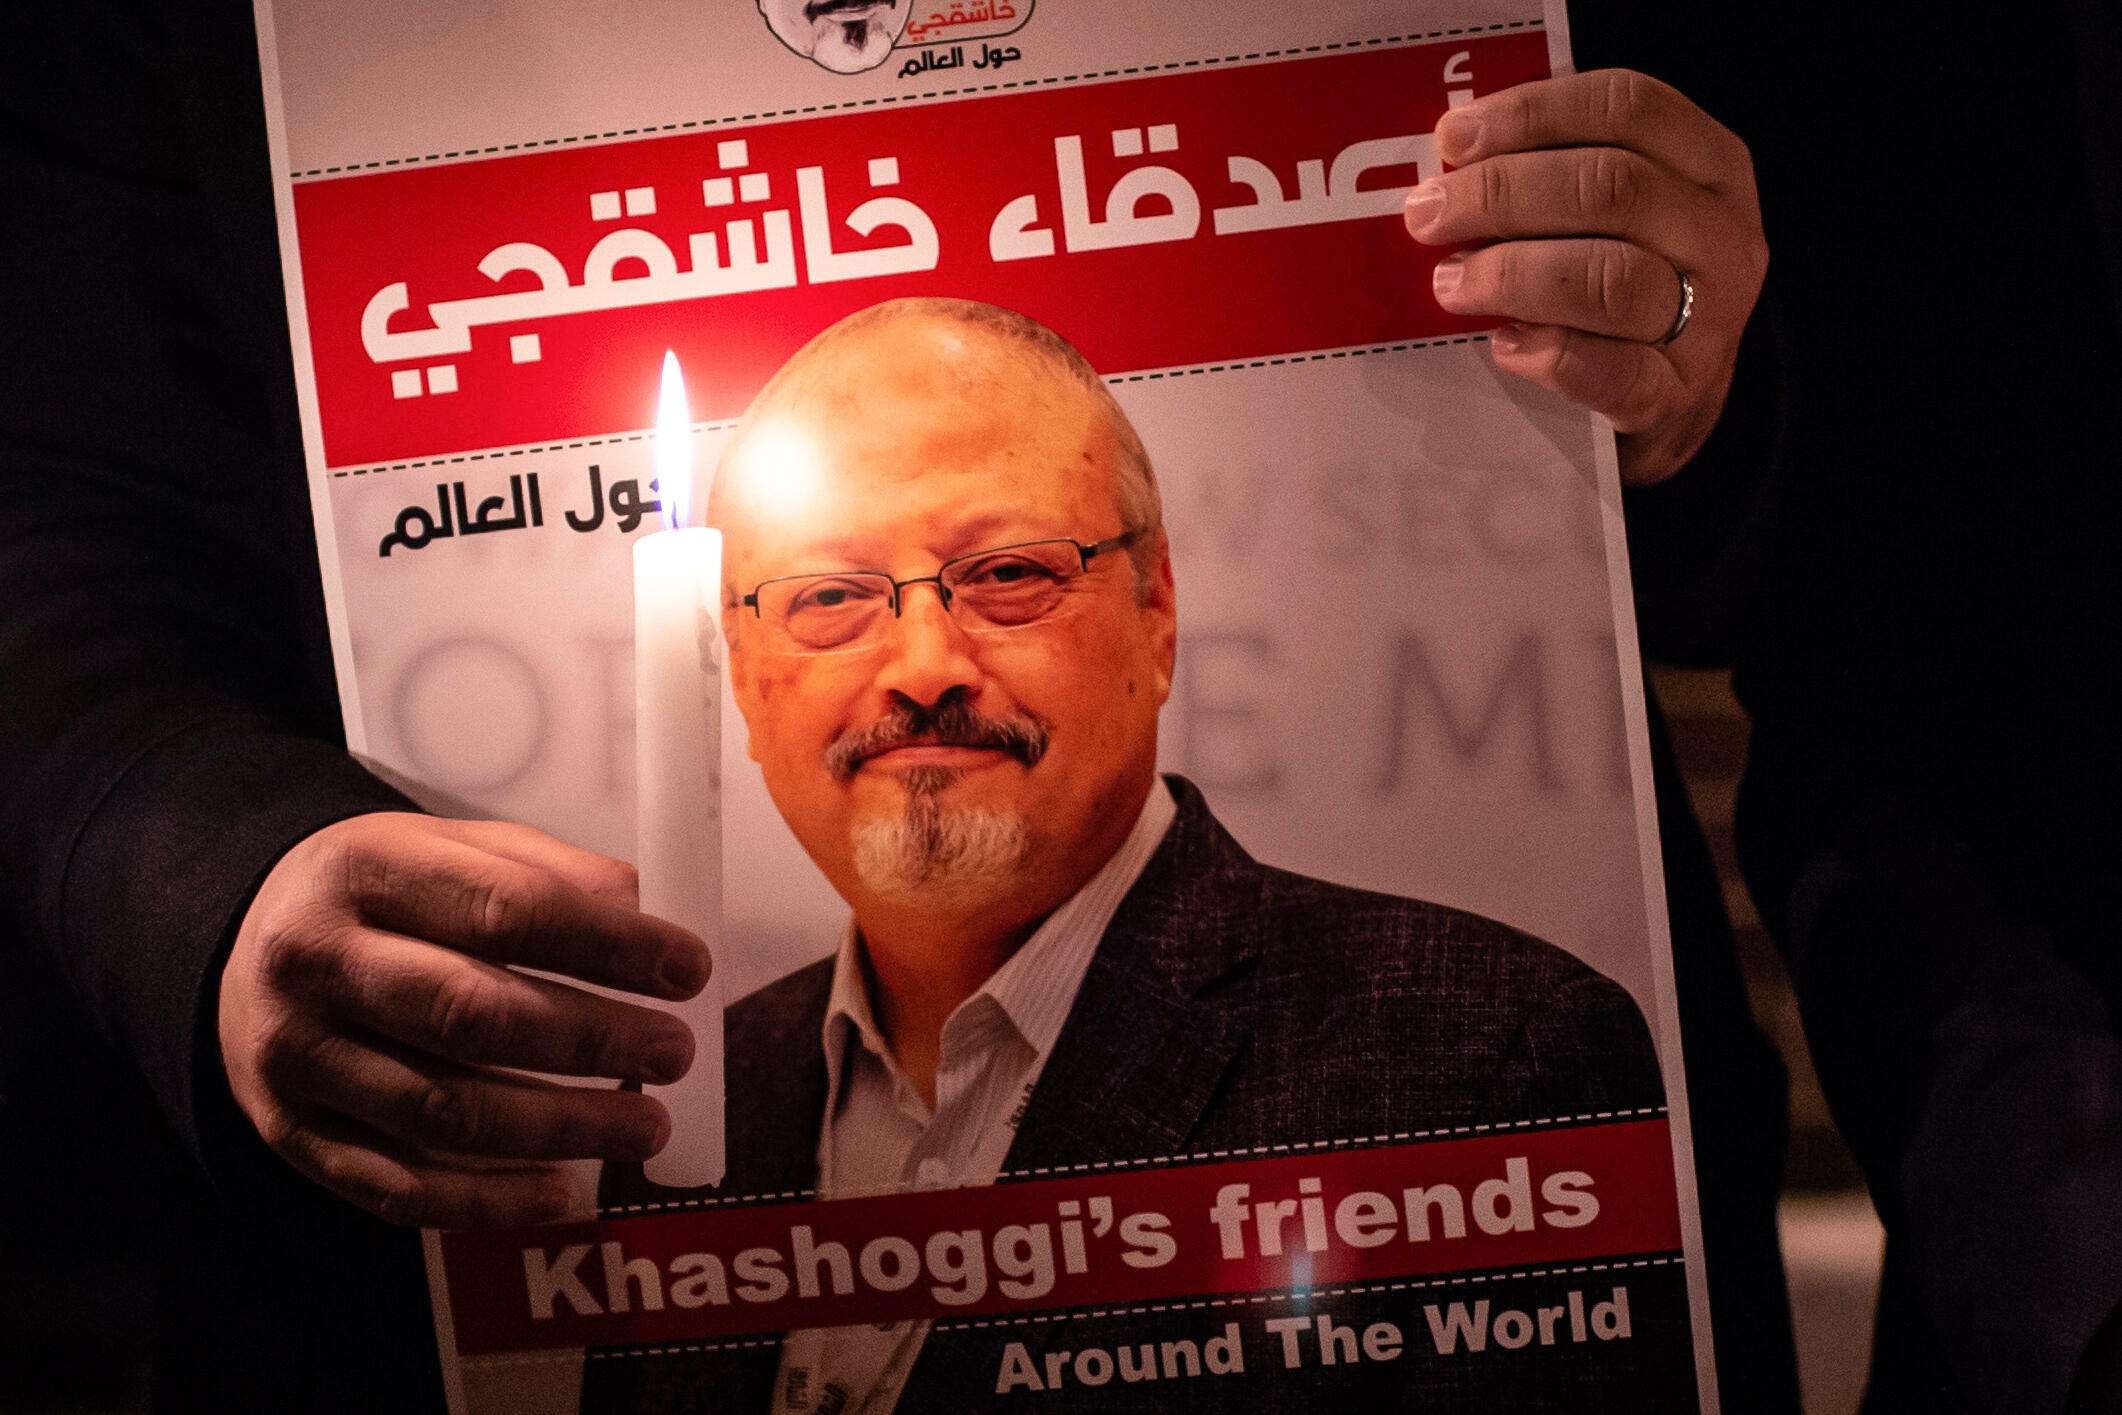 Washington vows to prevent a repeat of the Khashoggi murder, Arabic newspaper -Profile News